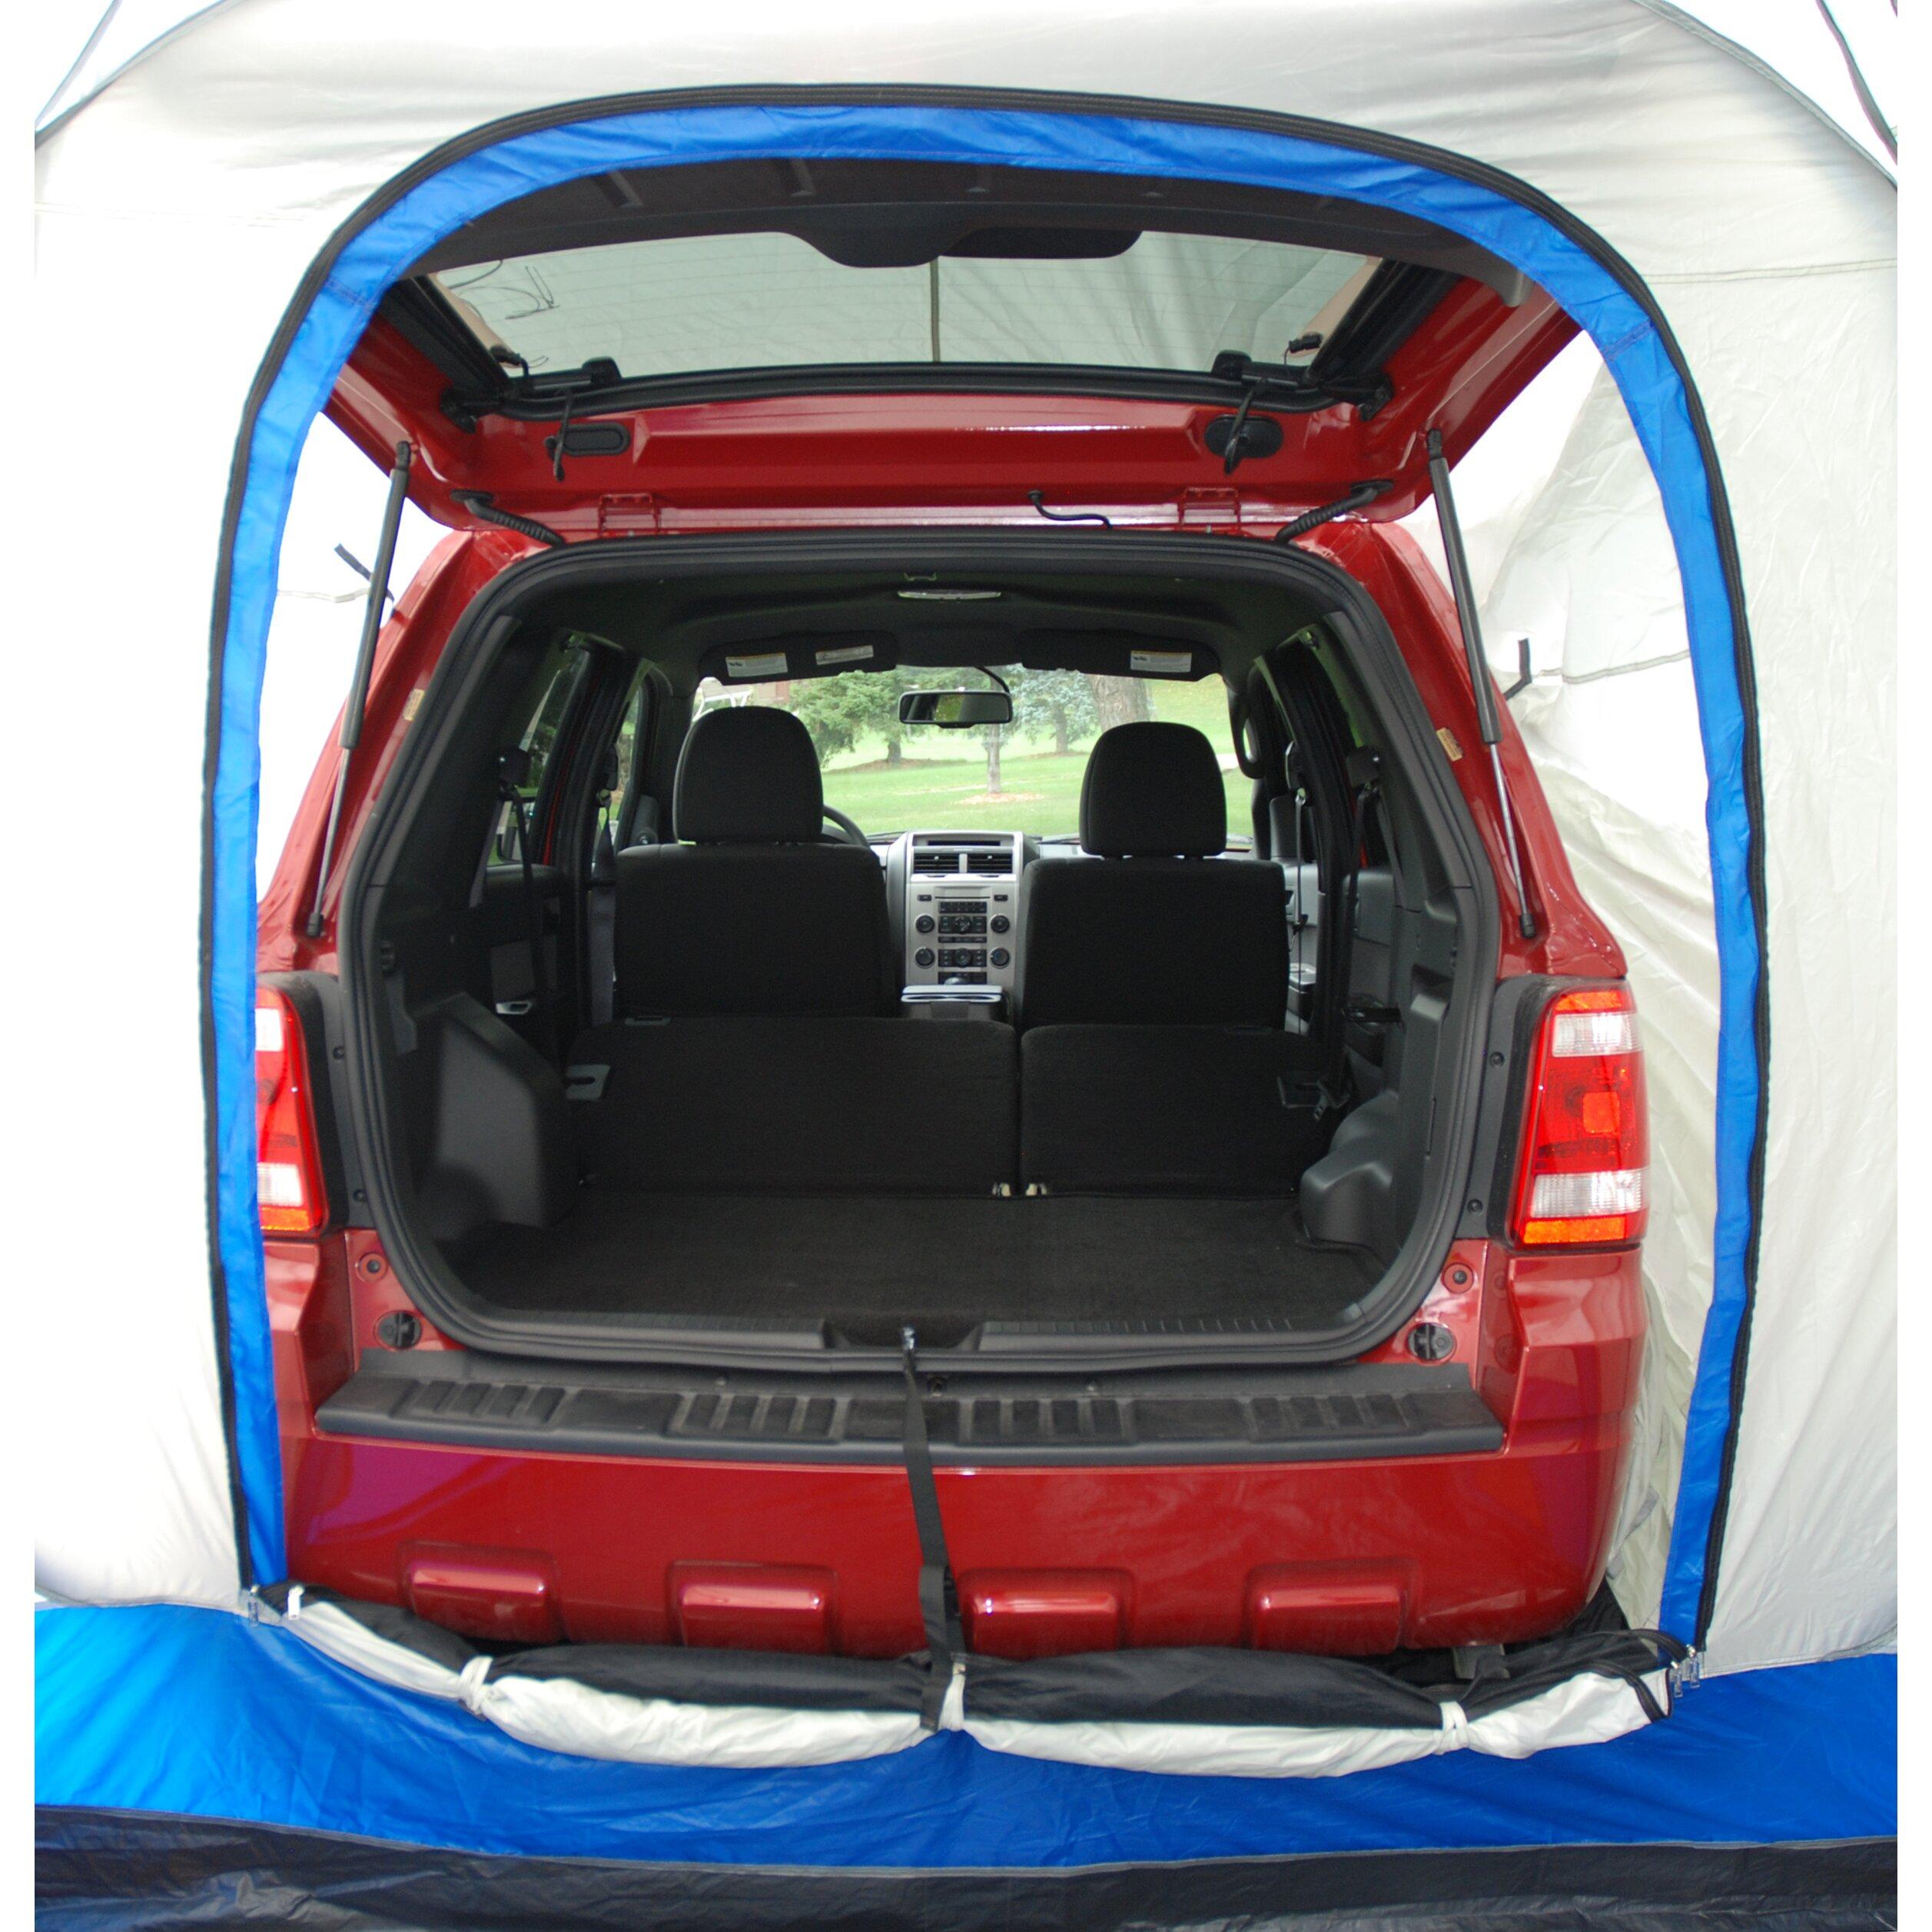 Napier Outdoors Sportz Suv Tent Amp Reviews Wayfair